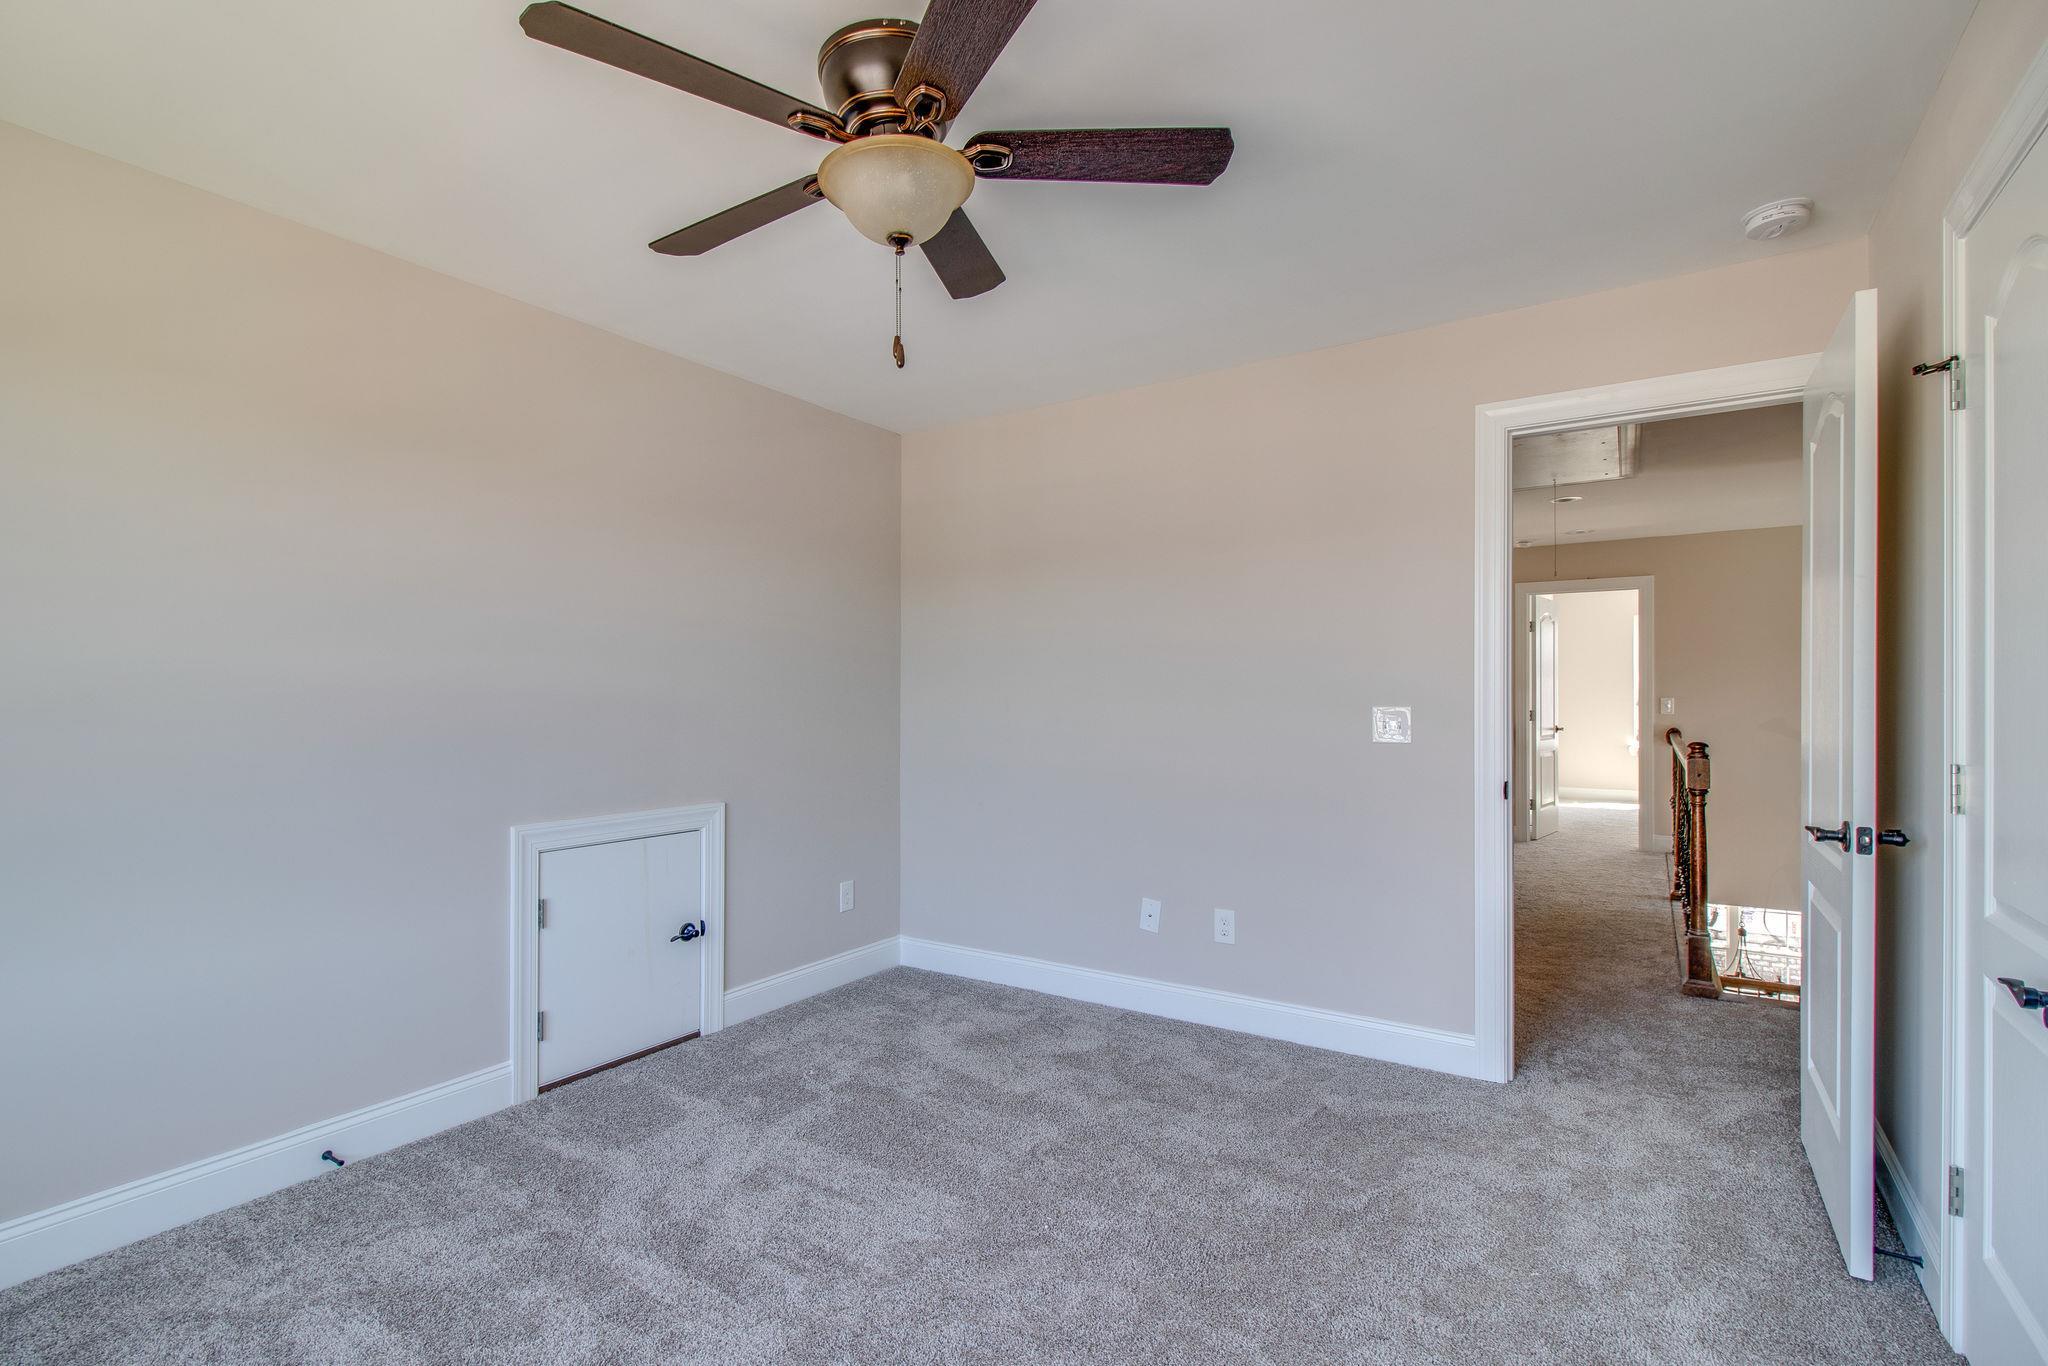 5926 Covent Ln, Smyrna, TN 37167 - Smyrna, TN real estate listing